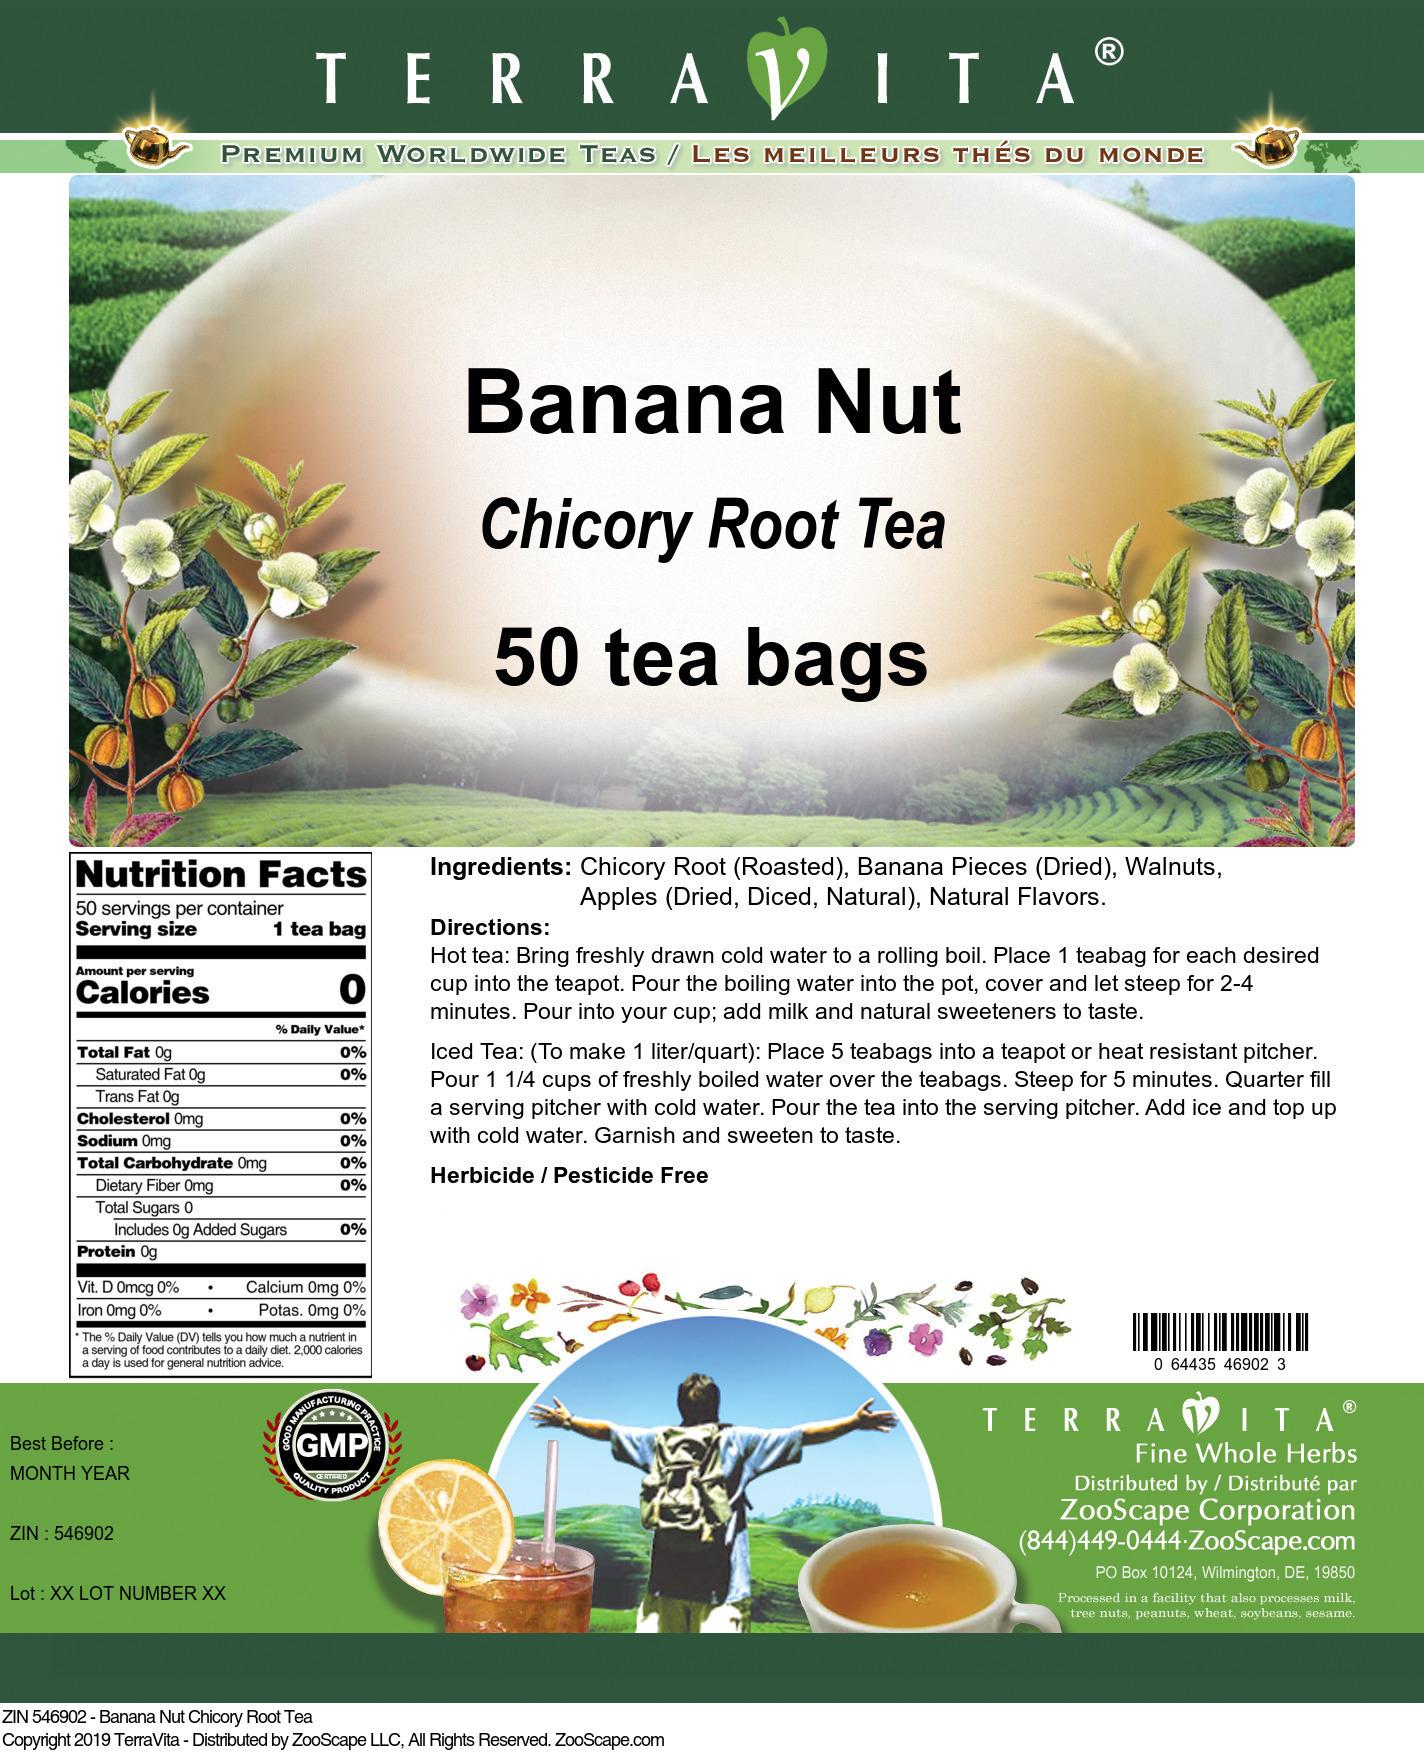 Banana Nut Chicory Root Tea